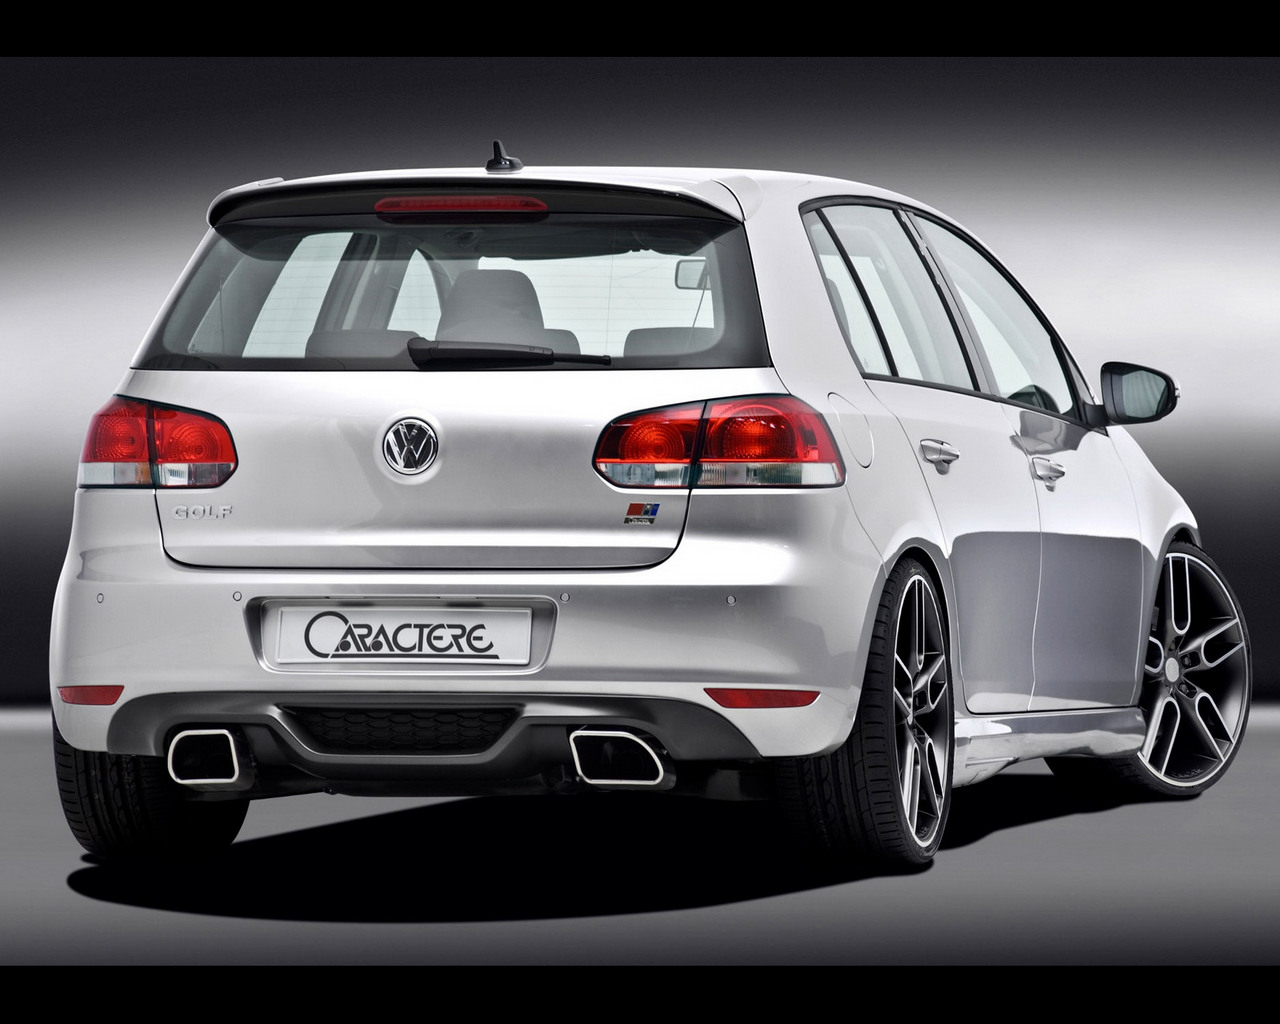 Picture Volkswagen Vw Golf 6 Cars